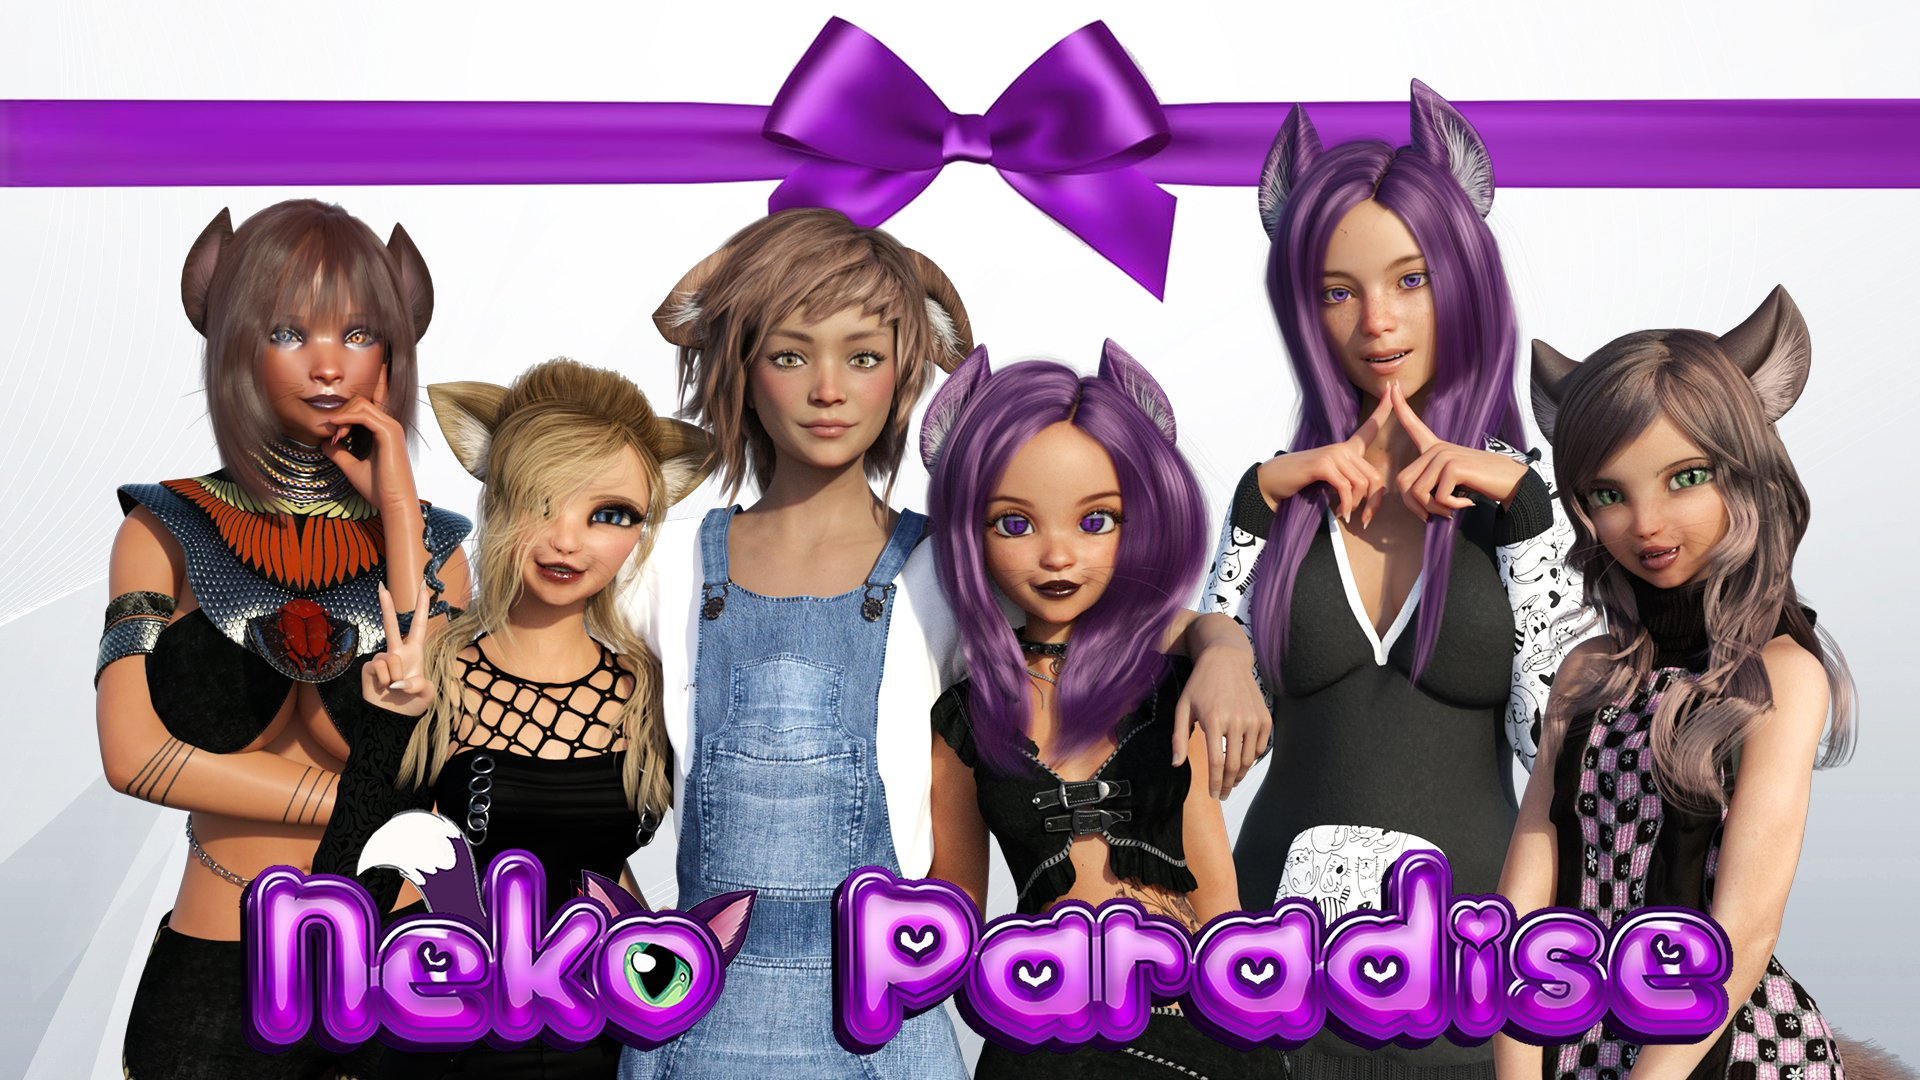 Neko Paradise by Alorth